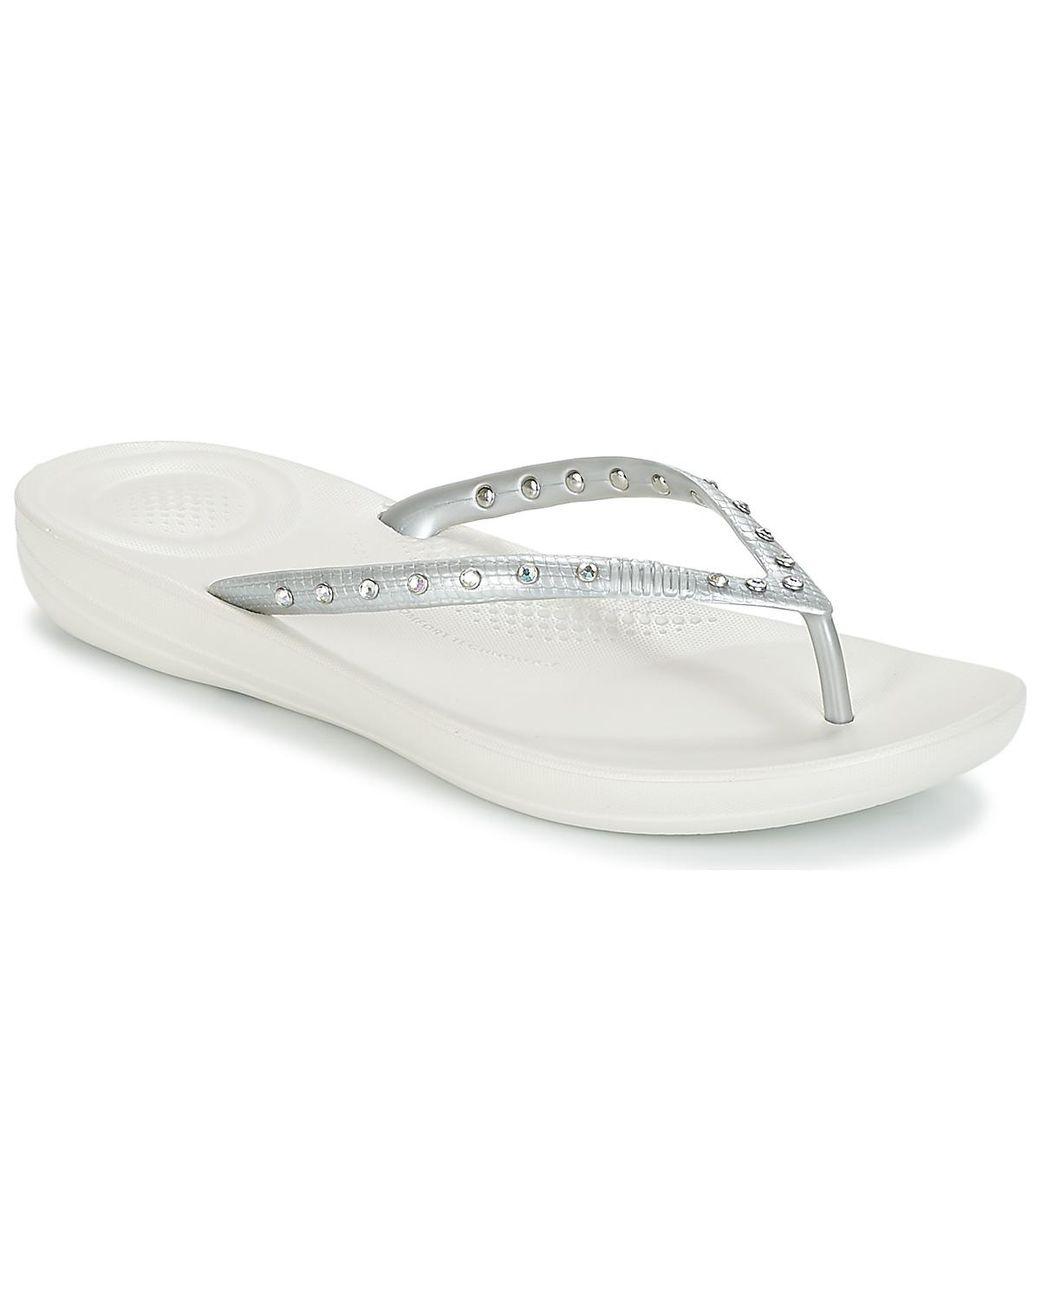 5f240f446 Fitflop Iqushion Ergonomic Flip Flops Crystal Women s Flip Flops ...